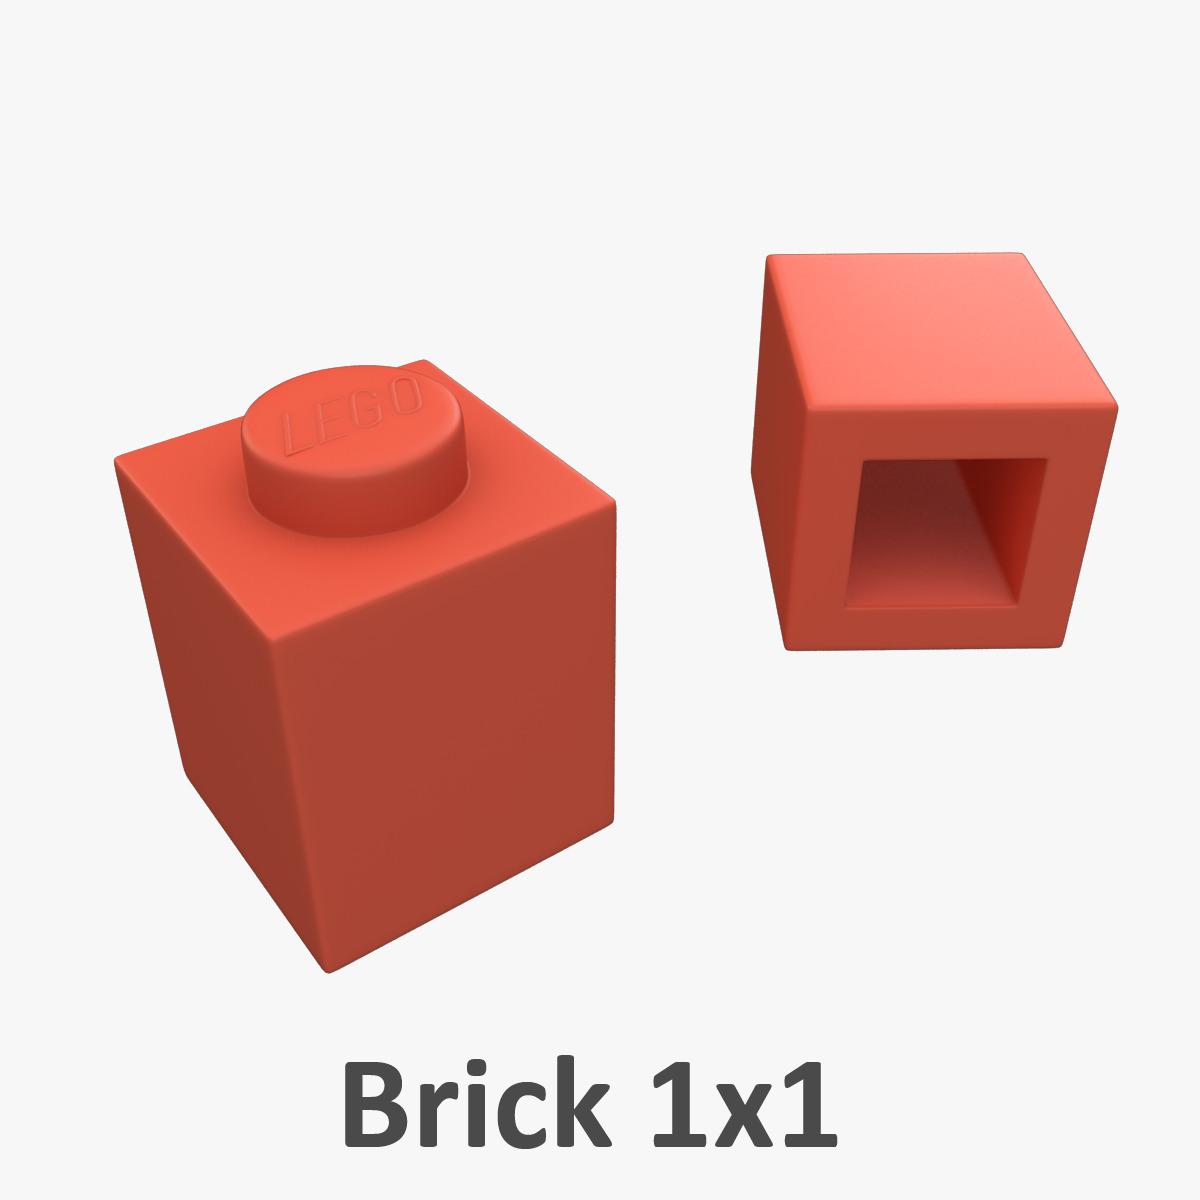 Lego Bricks 1x1 by mindfreeartist | 3DOcean